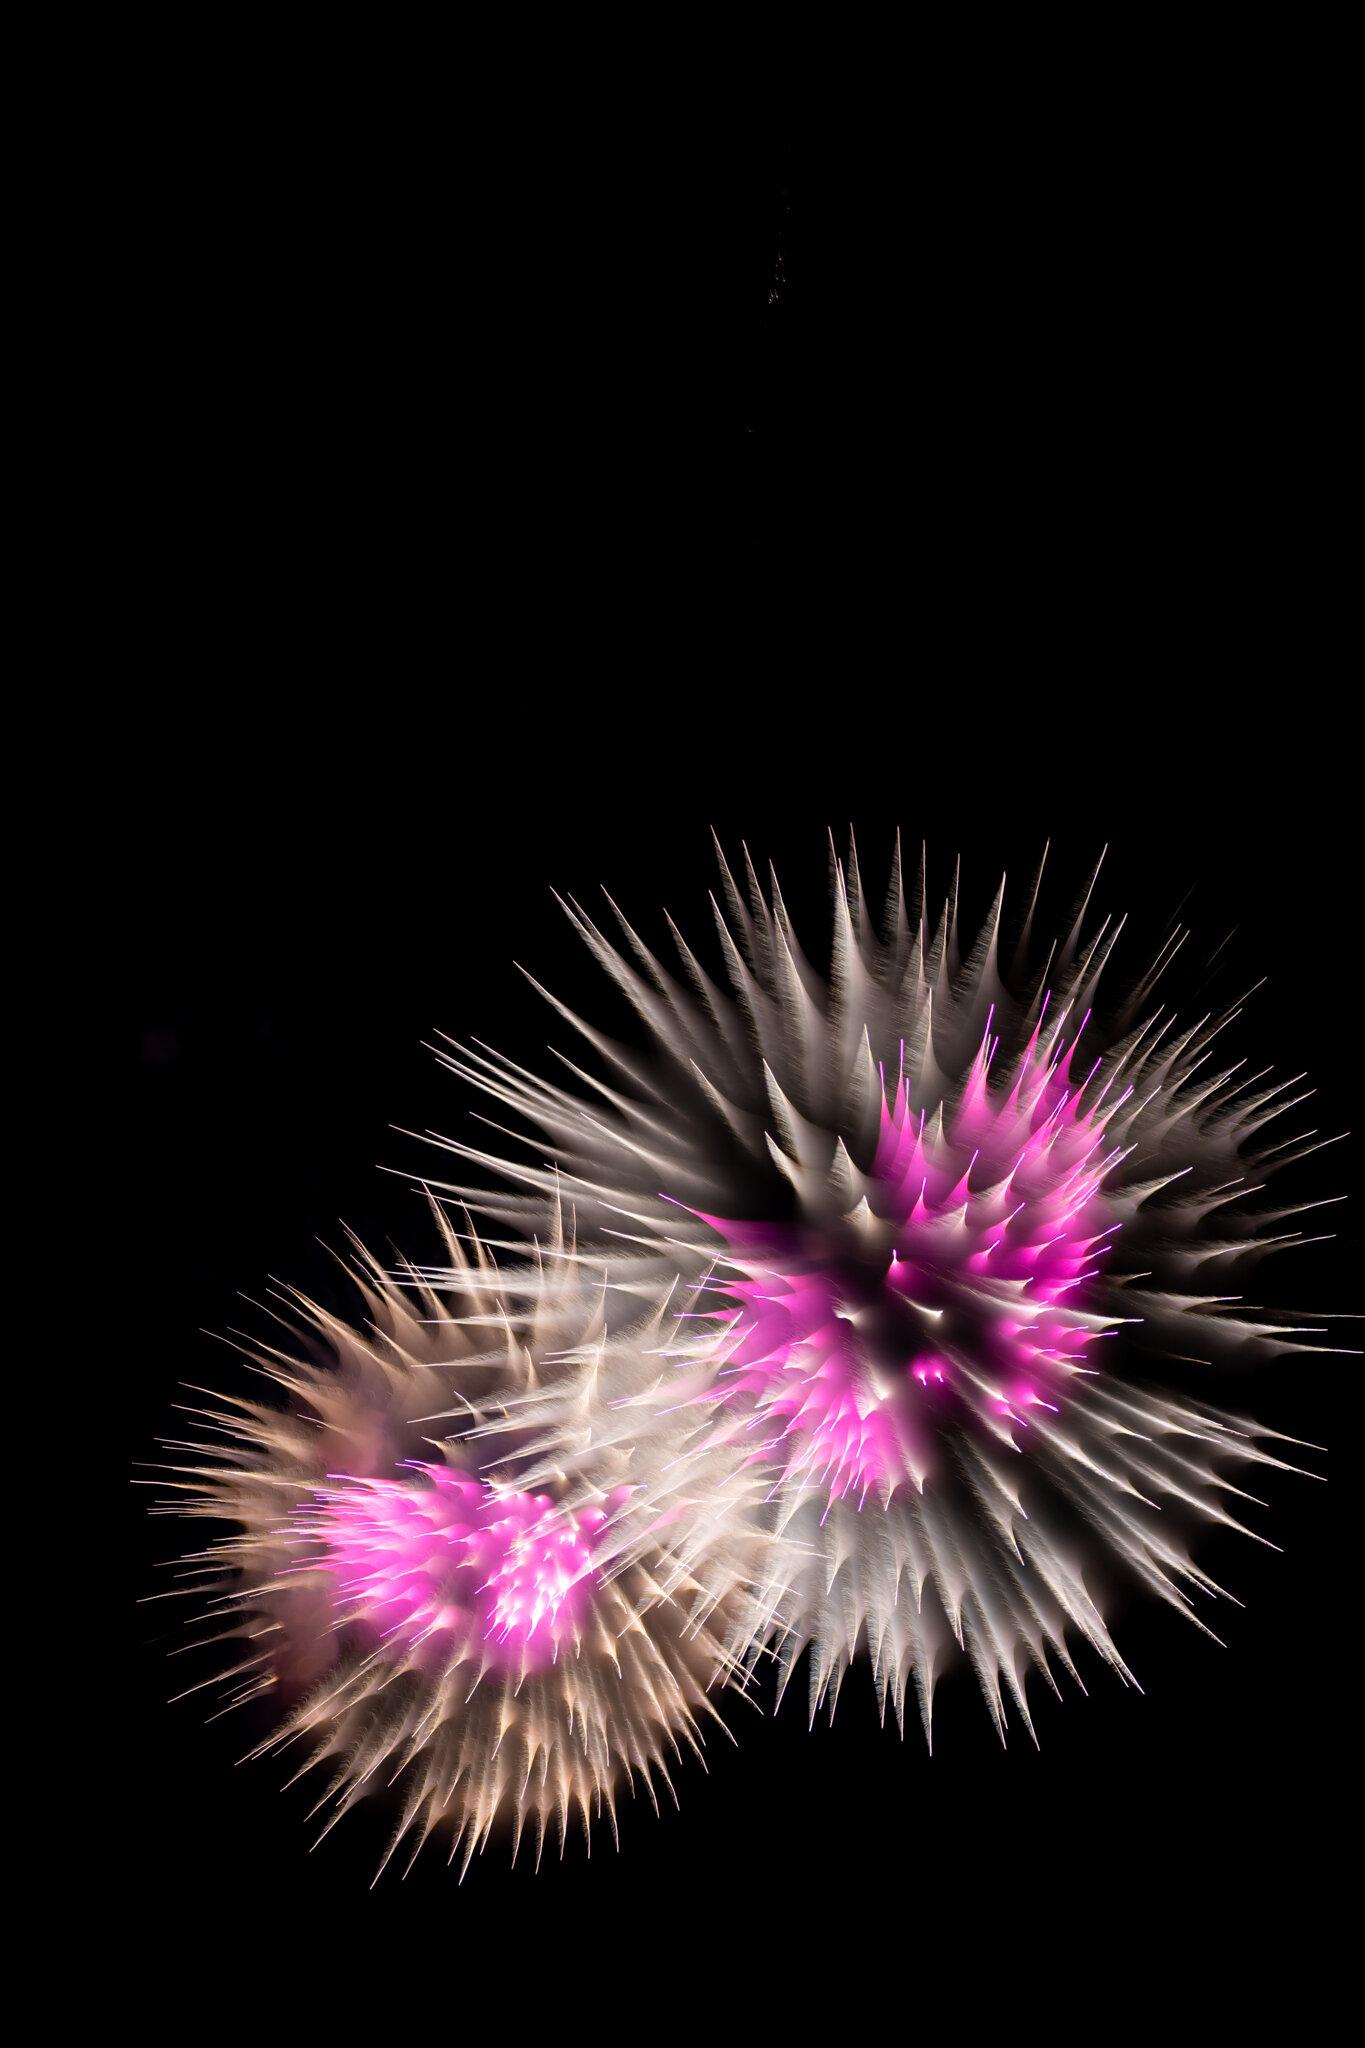 focuspulledfireworks-26.jpg